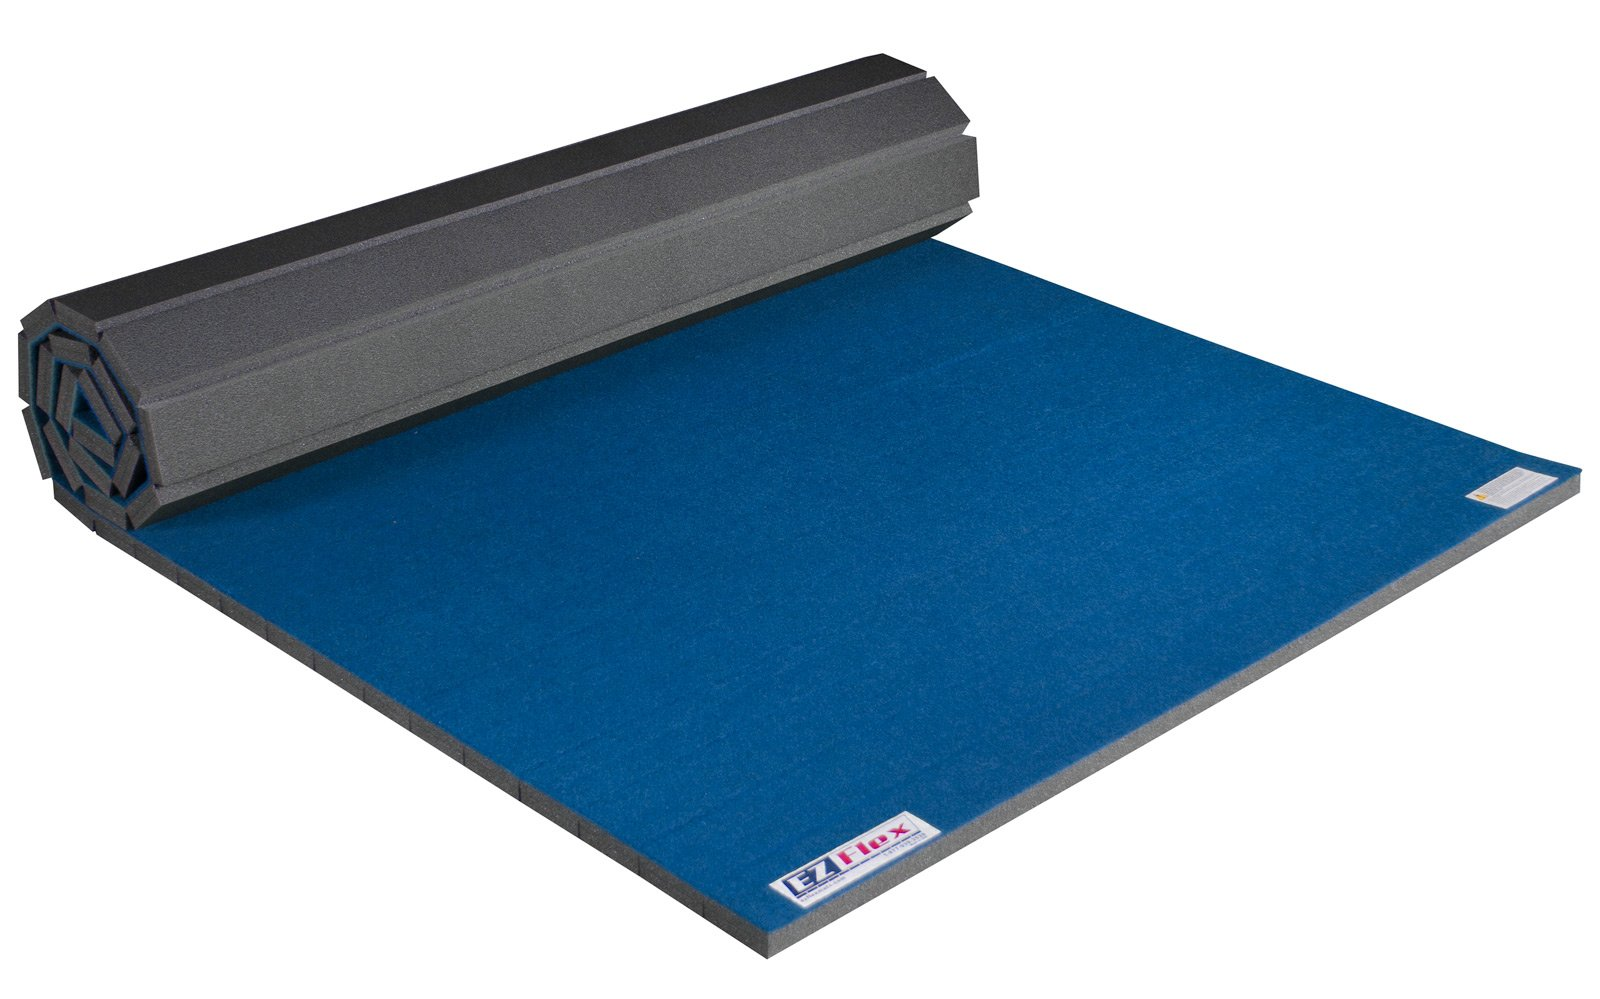 EZ Flex 5' x 10' Home Cheerleading/Gymnastics Mat (Blue) by EZ Flex Sport Mats (Image #1)